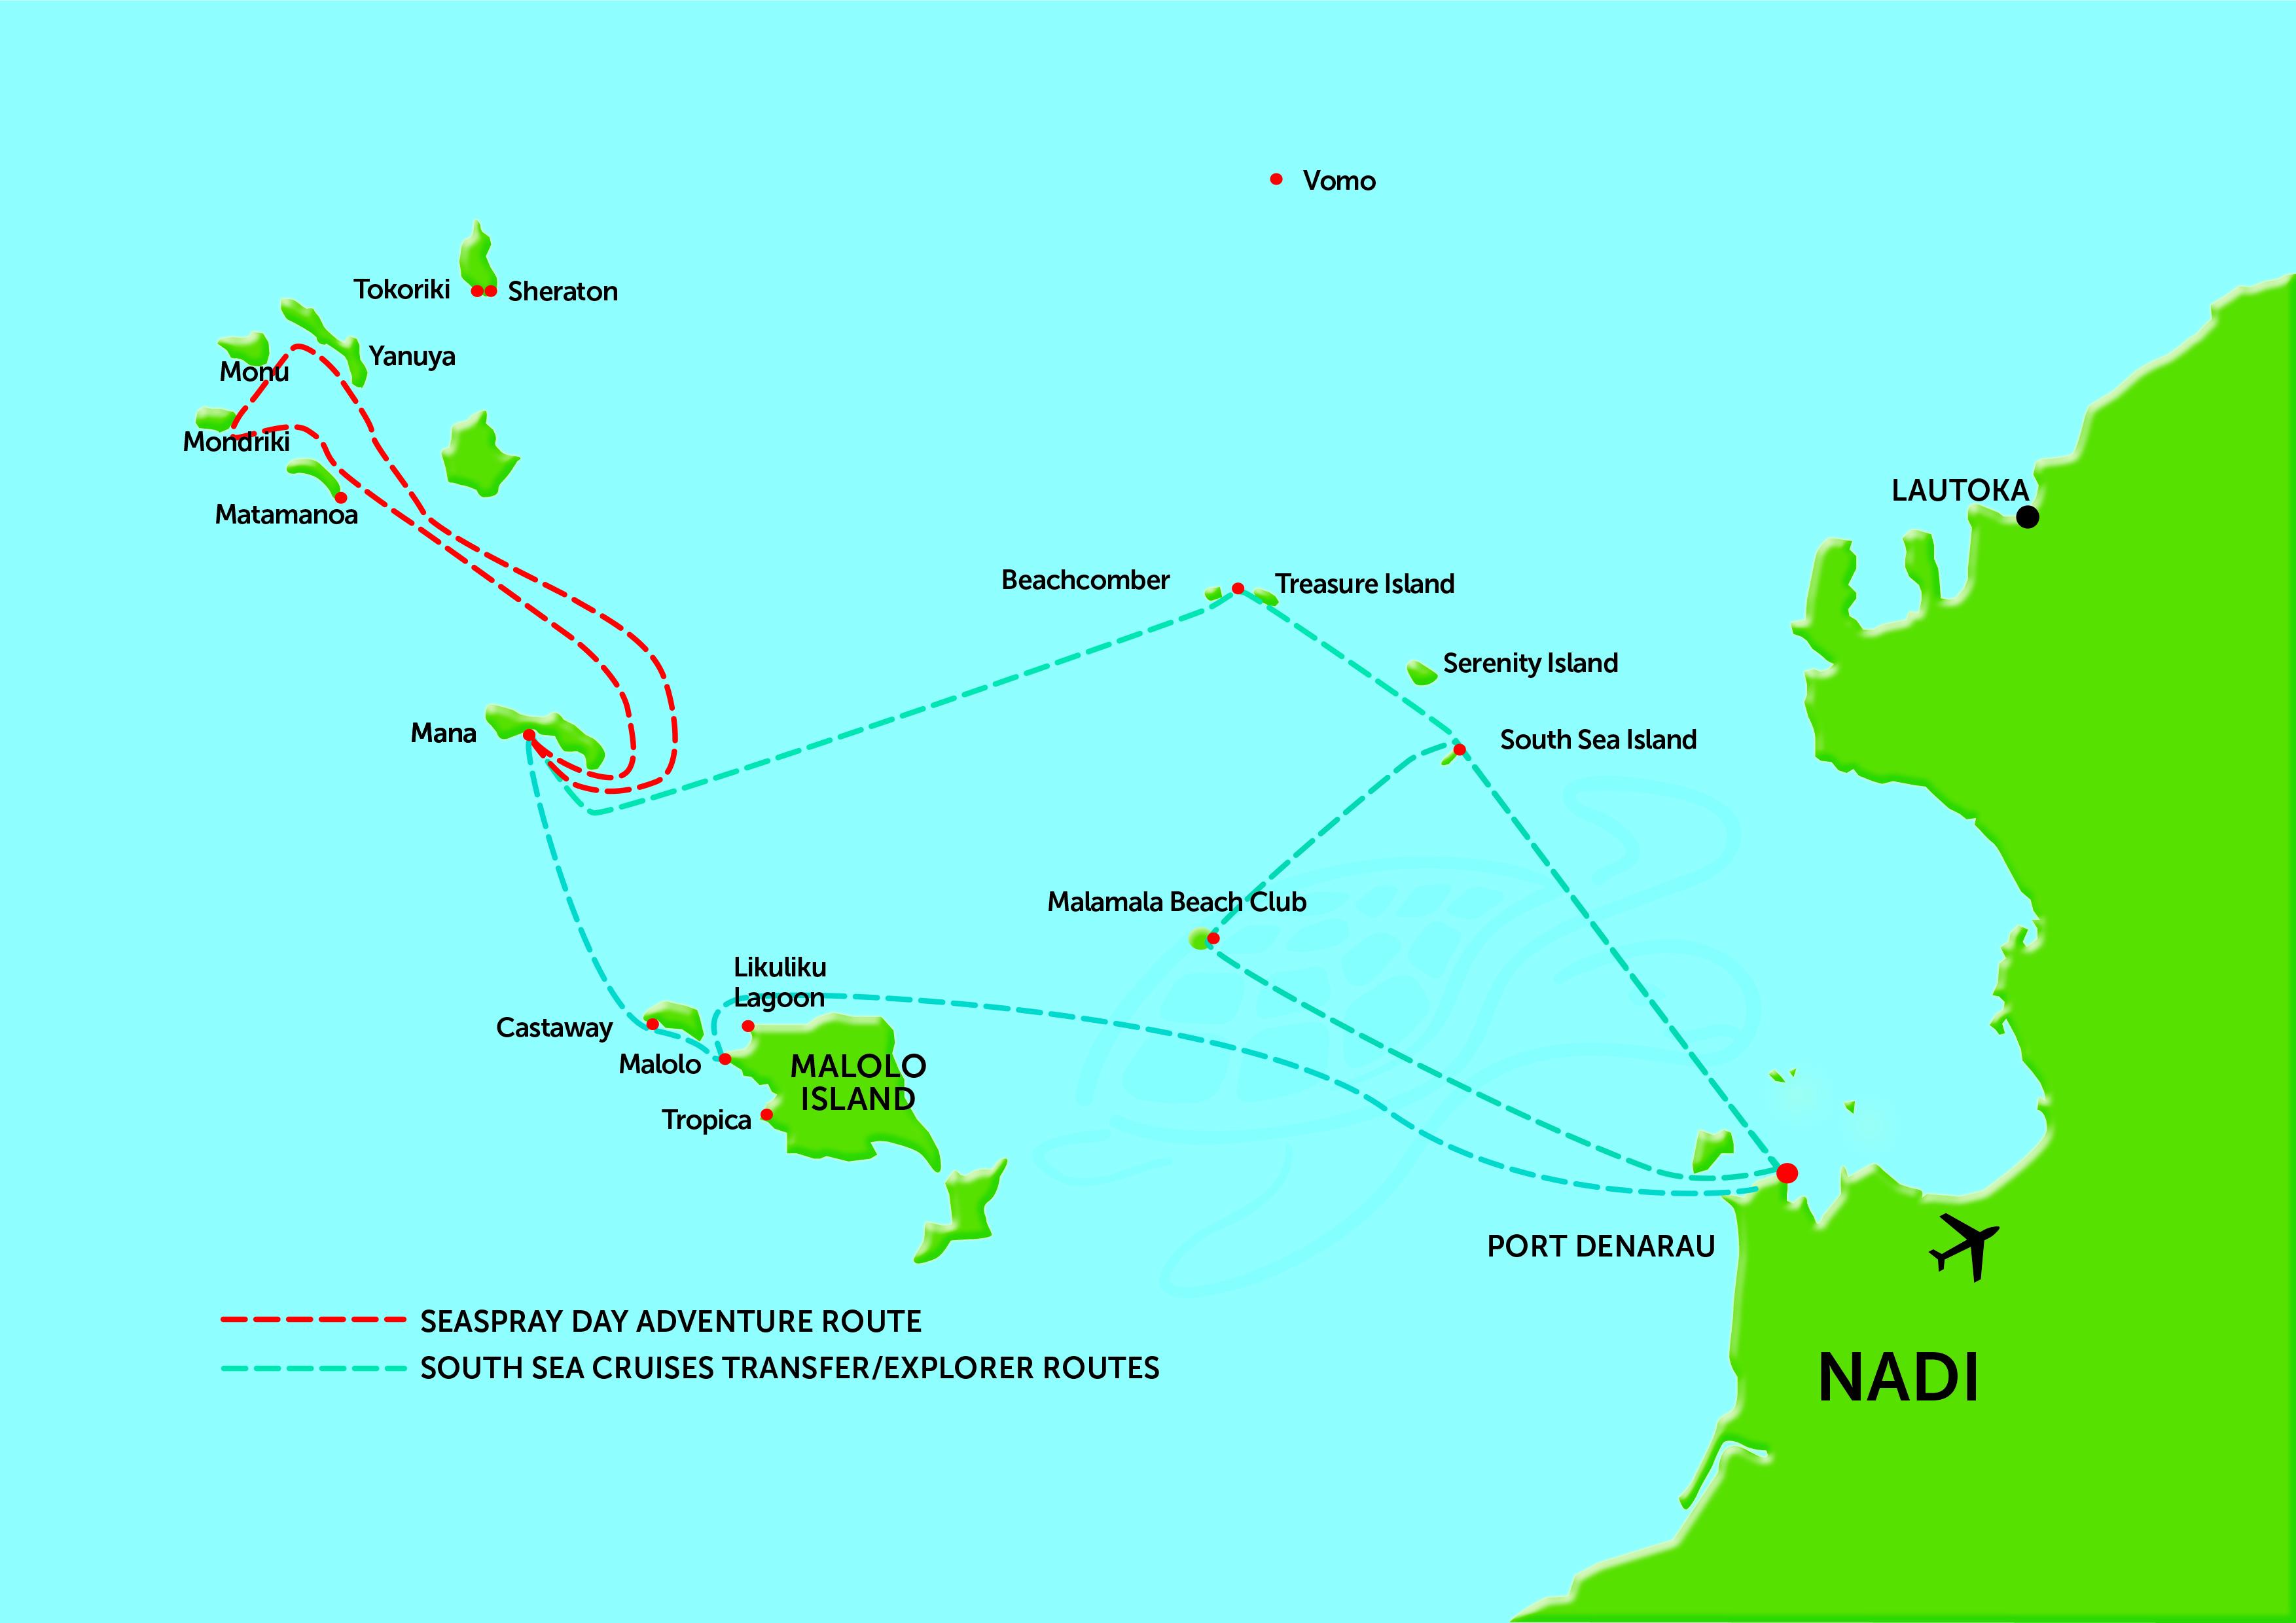 Fiji Island Resort Transfers & Connections | South Sea Cruises